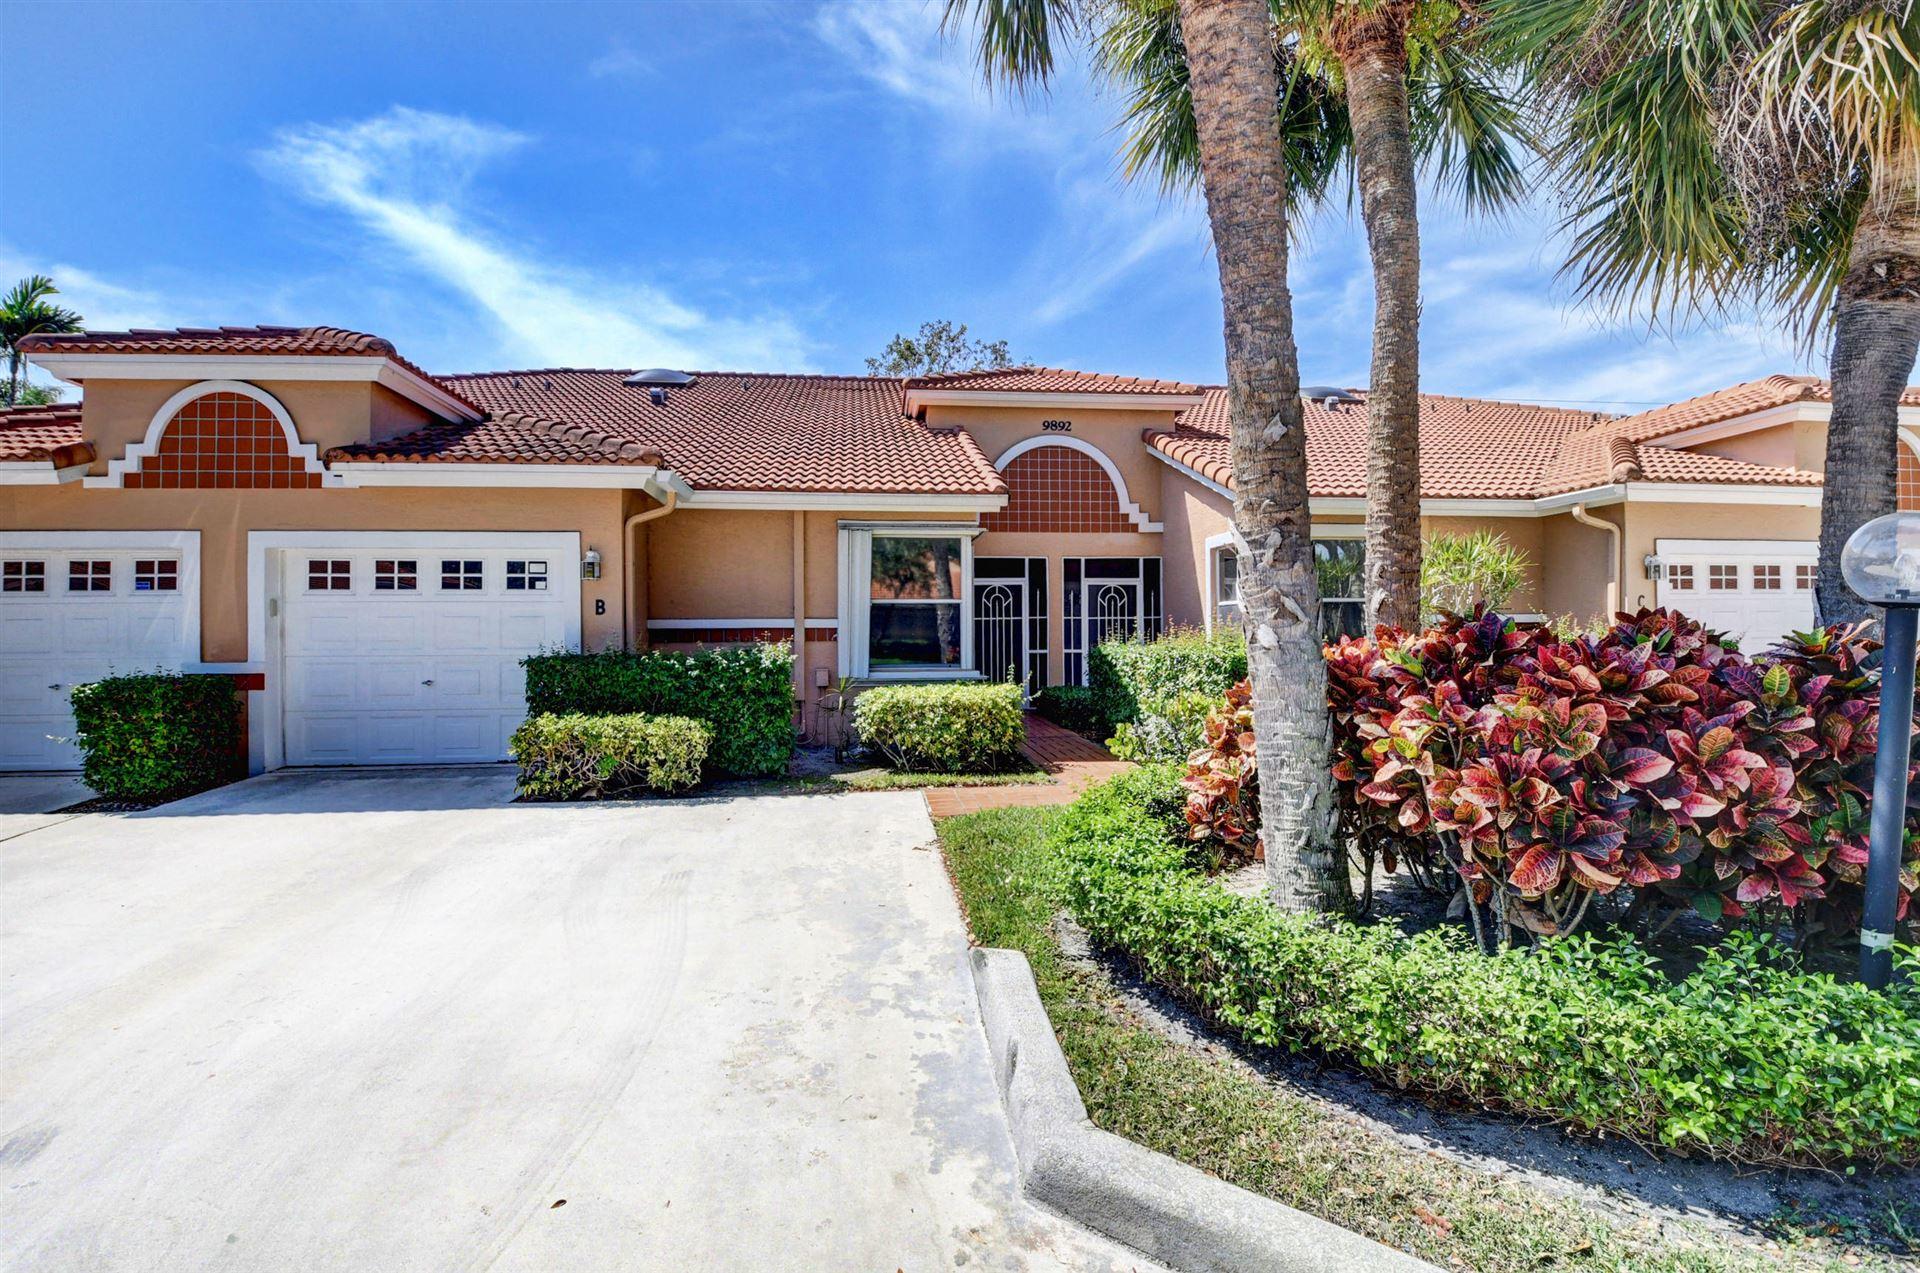 9892 Summerbrook Terrace #B, Boynton Beach, FL 33437 - #: RX-10706555